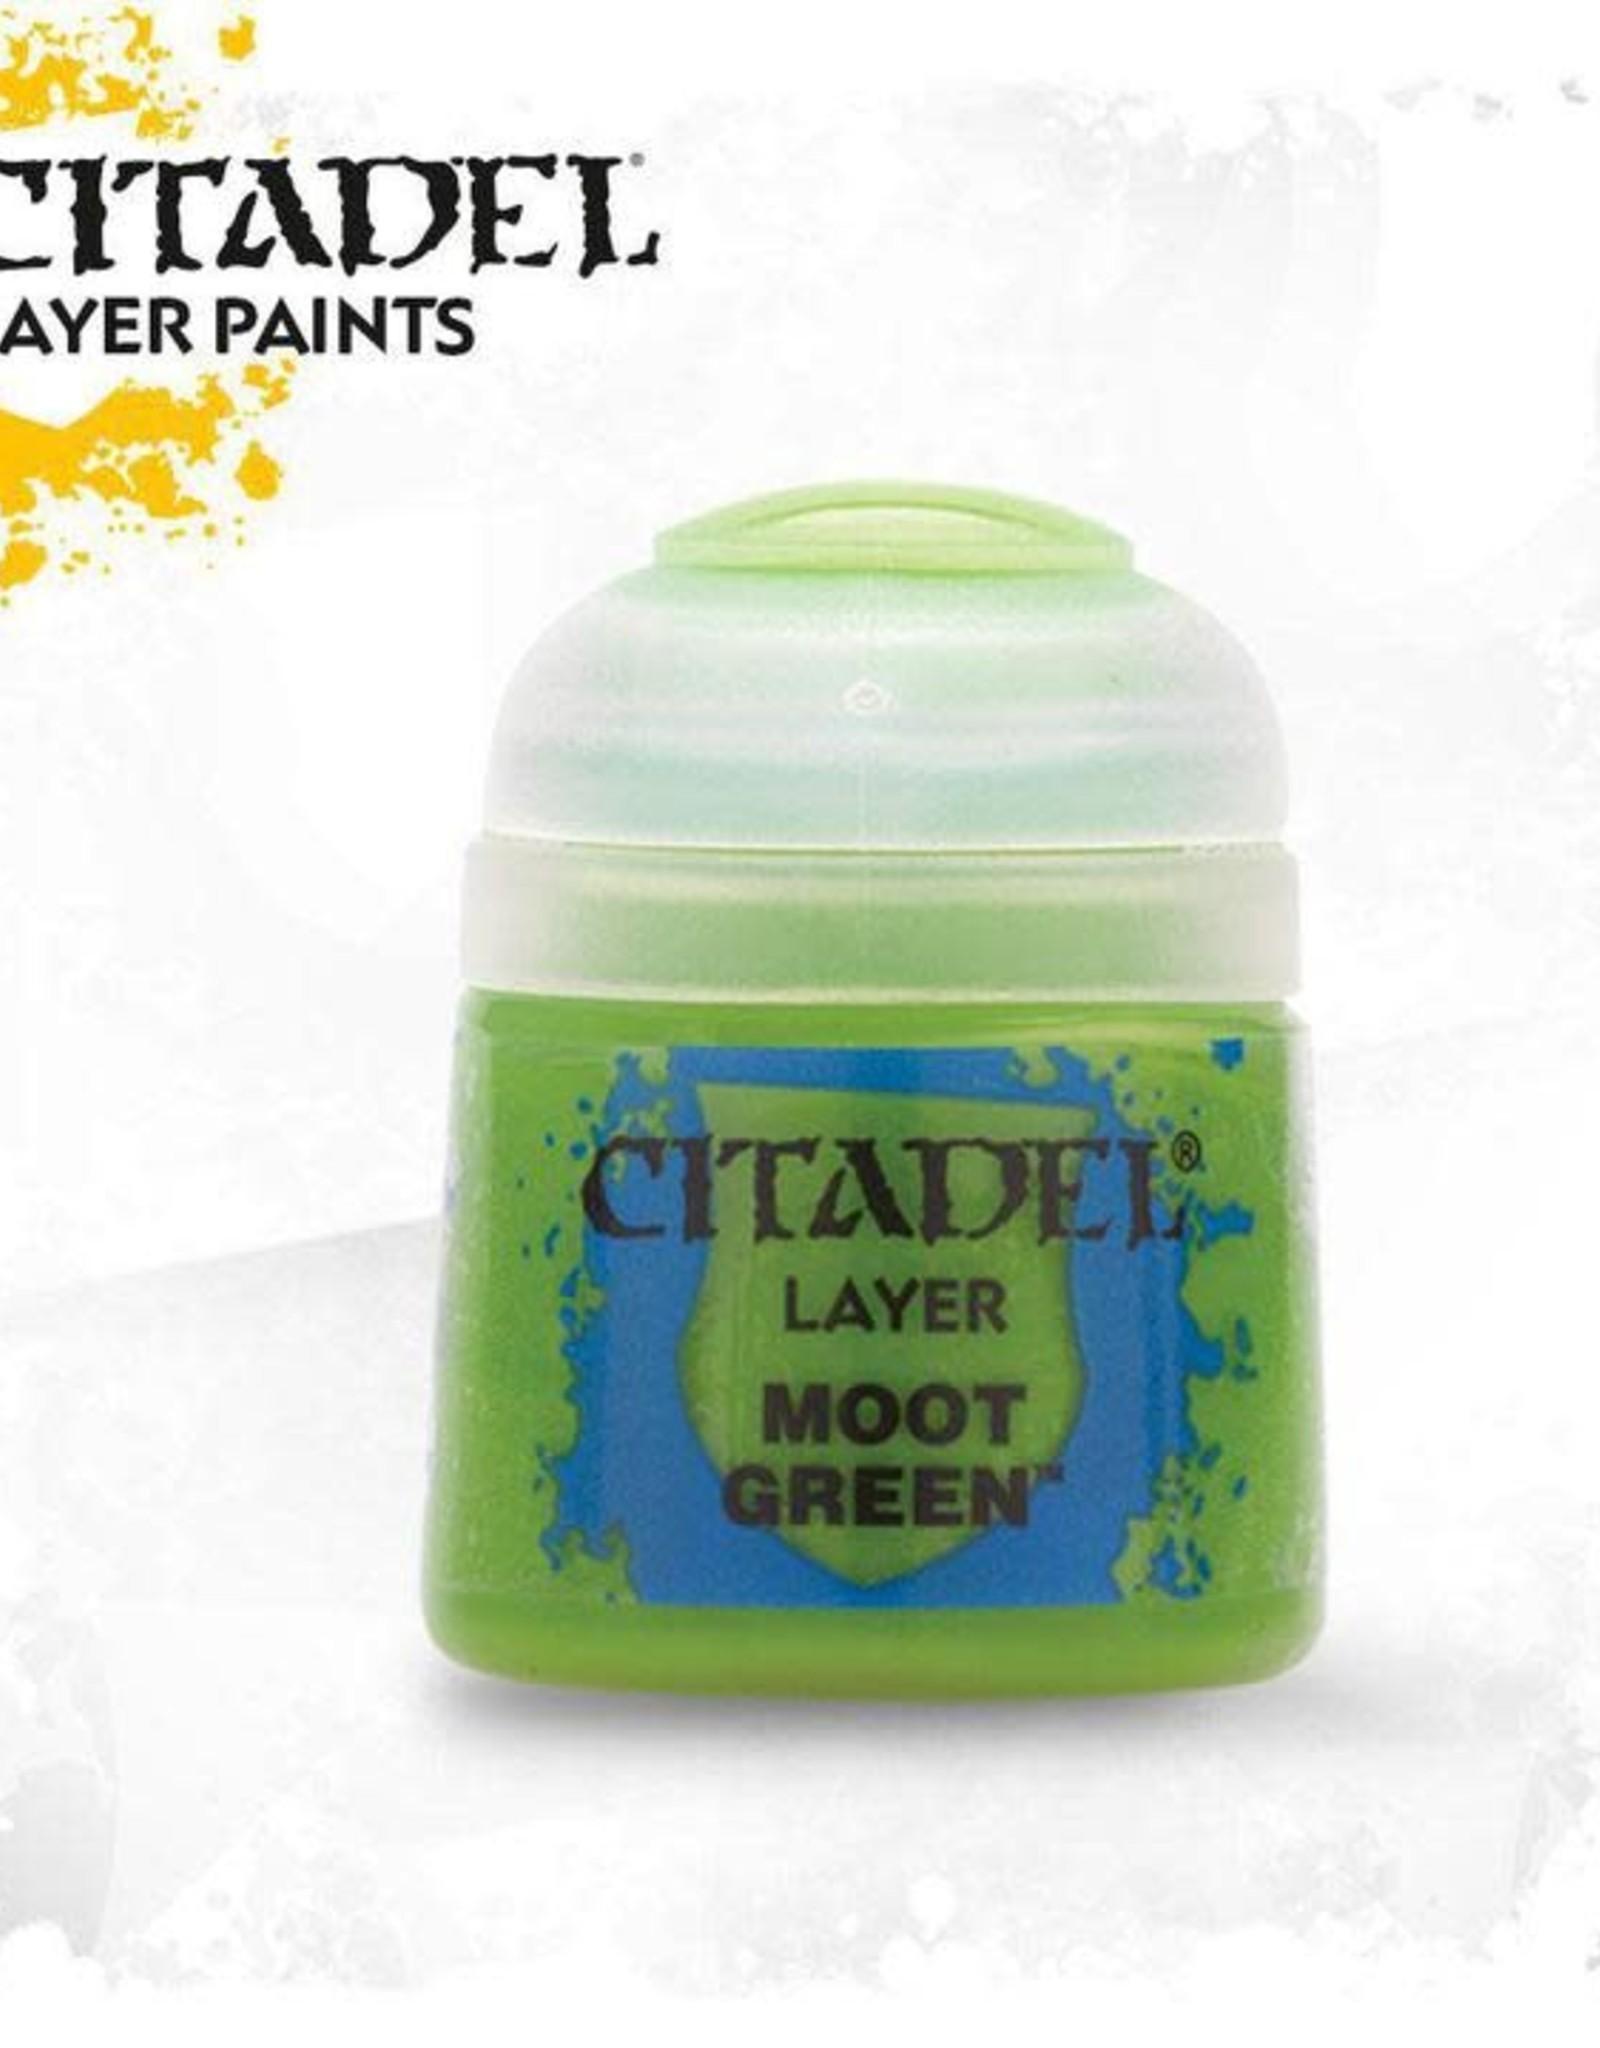 Games Workshop Citadel Paint: Layer - Moot Green